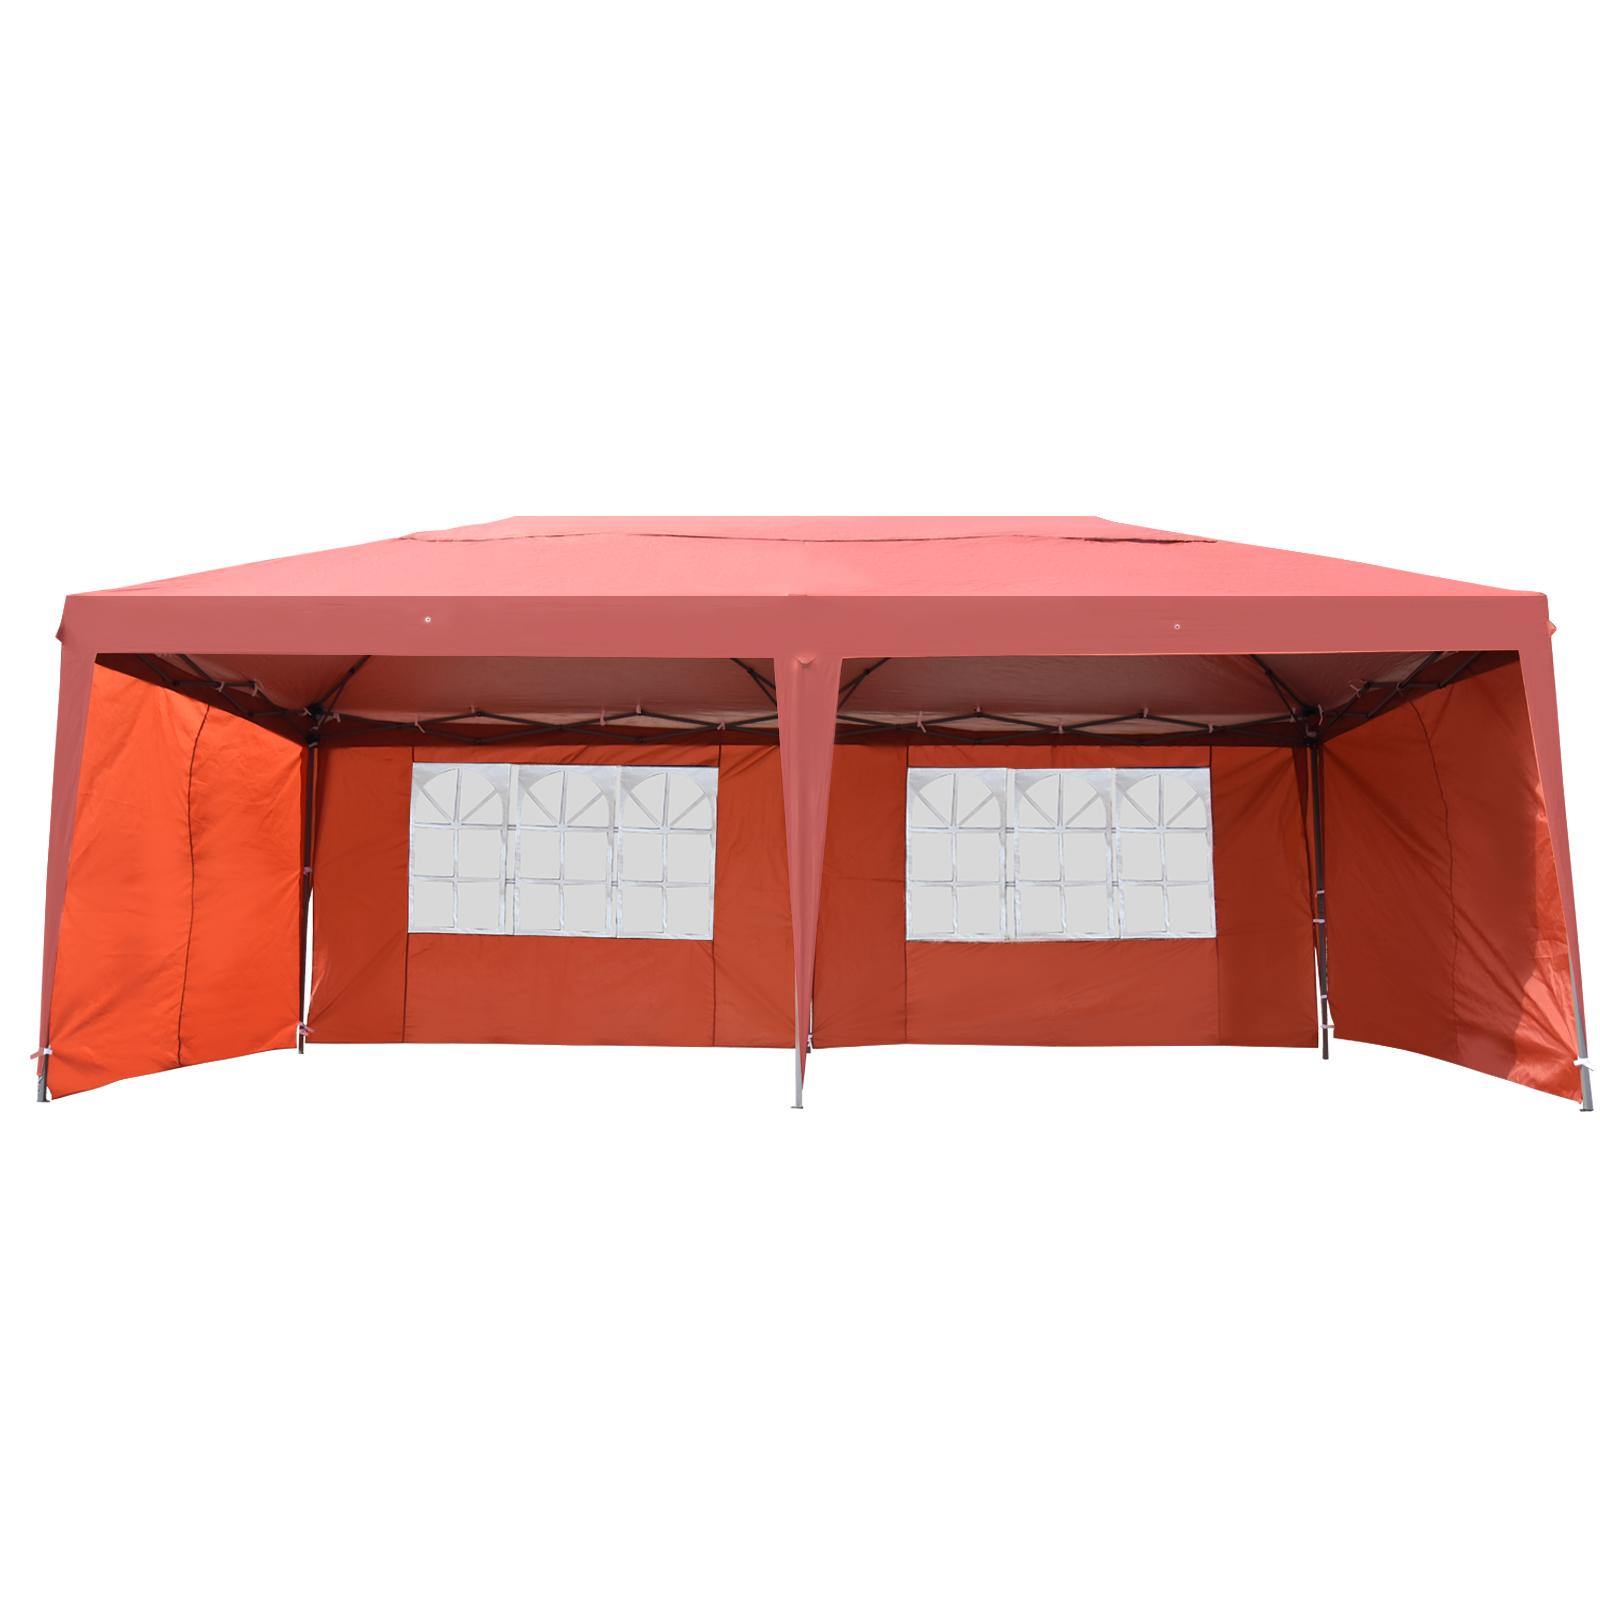 Outdoor-10-039-x20-039-EZ-POP-UP-Gazebo-Wedding-Party-Tent-Canopy-Folding-w-Carry-Bag thumbnail 35